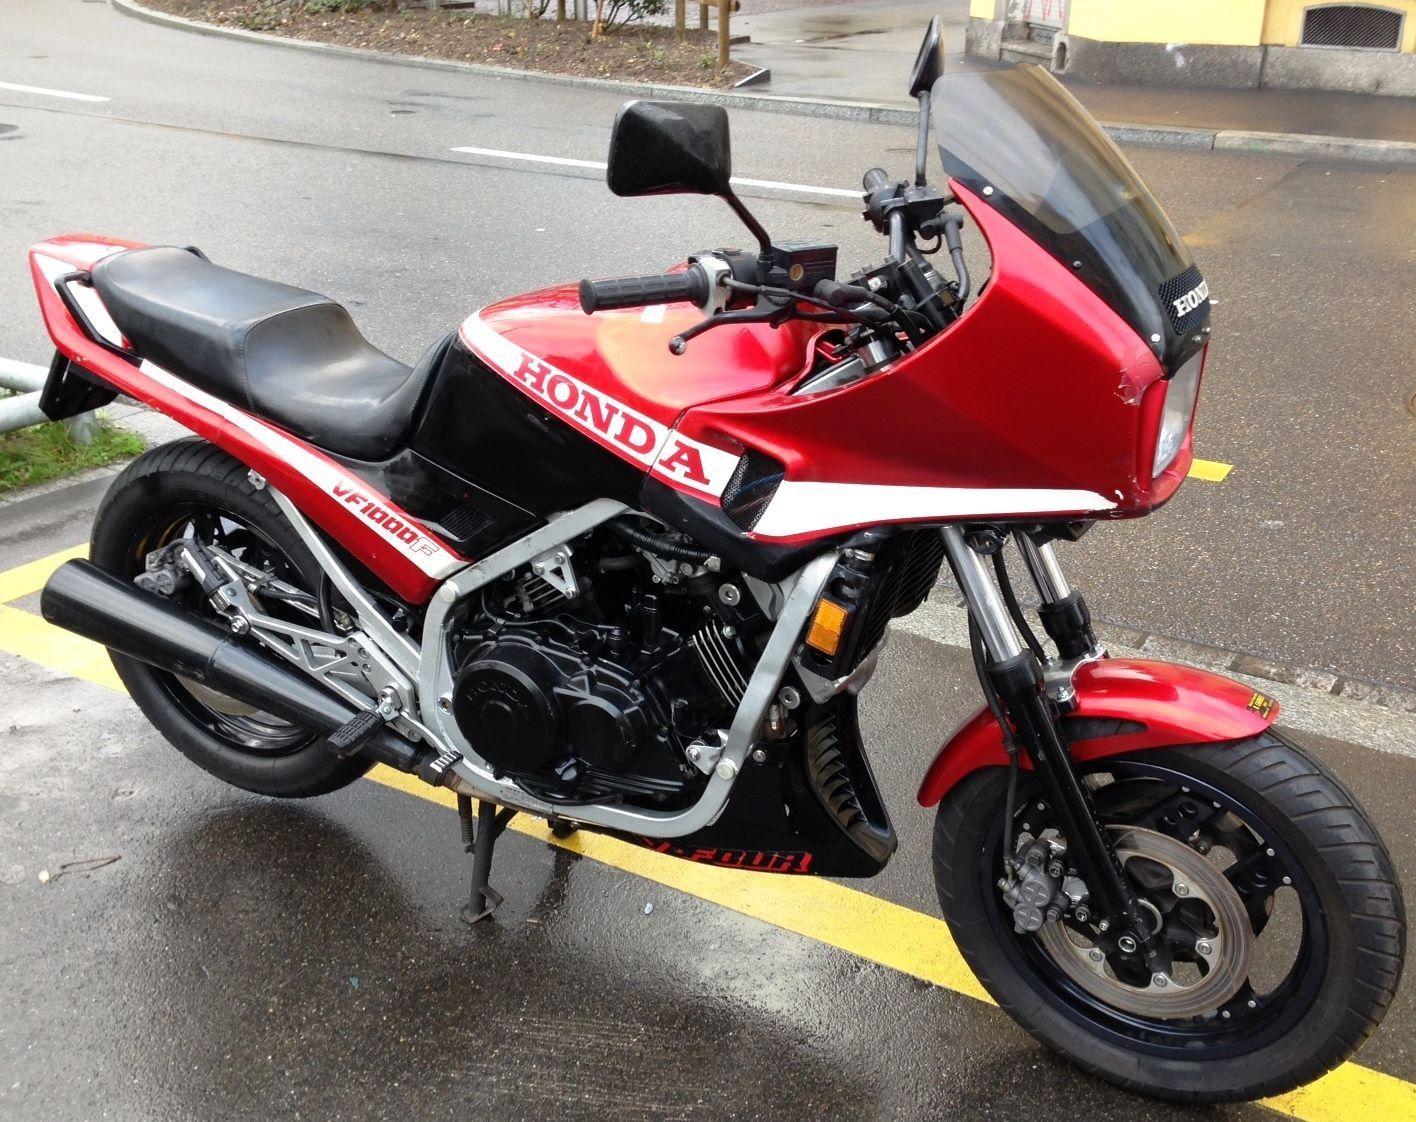 moto occasions acheter honda vf 1000 f cahenzli motos z rich. Black Bedroom Furniture Sets. Home Design Ideas